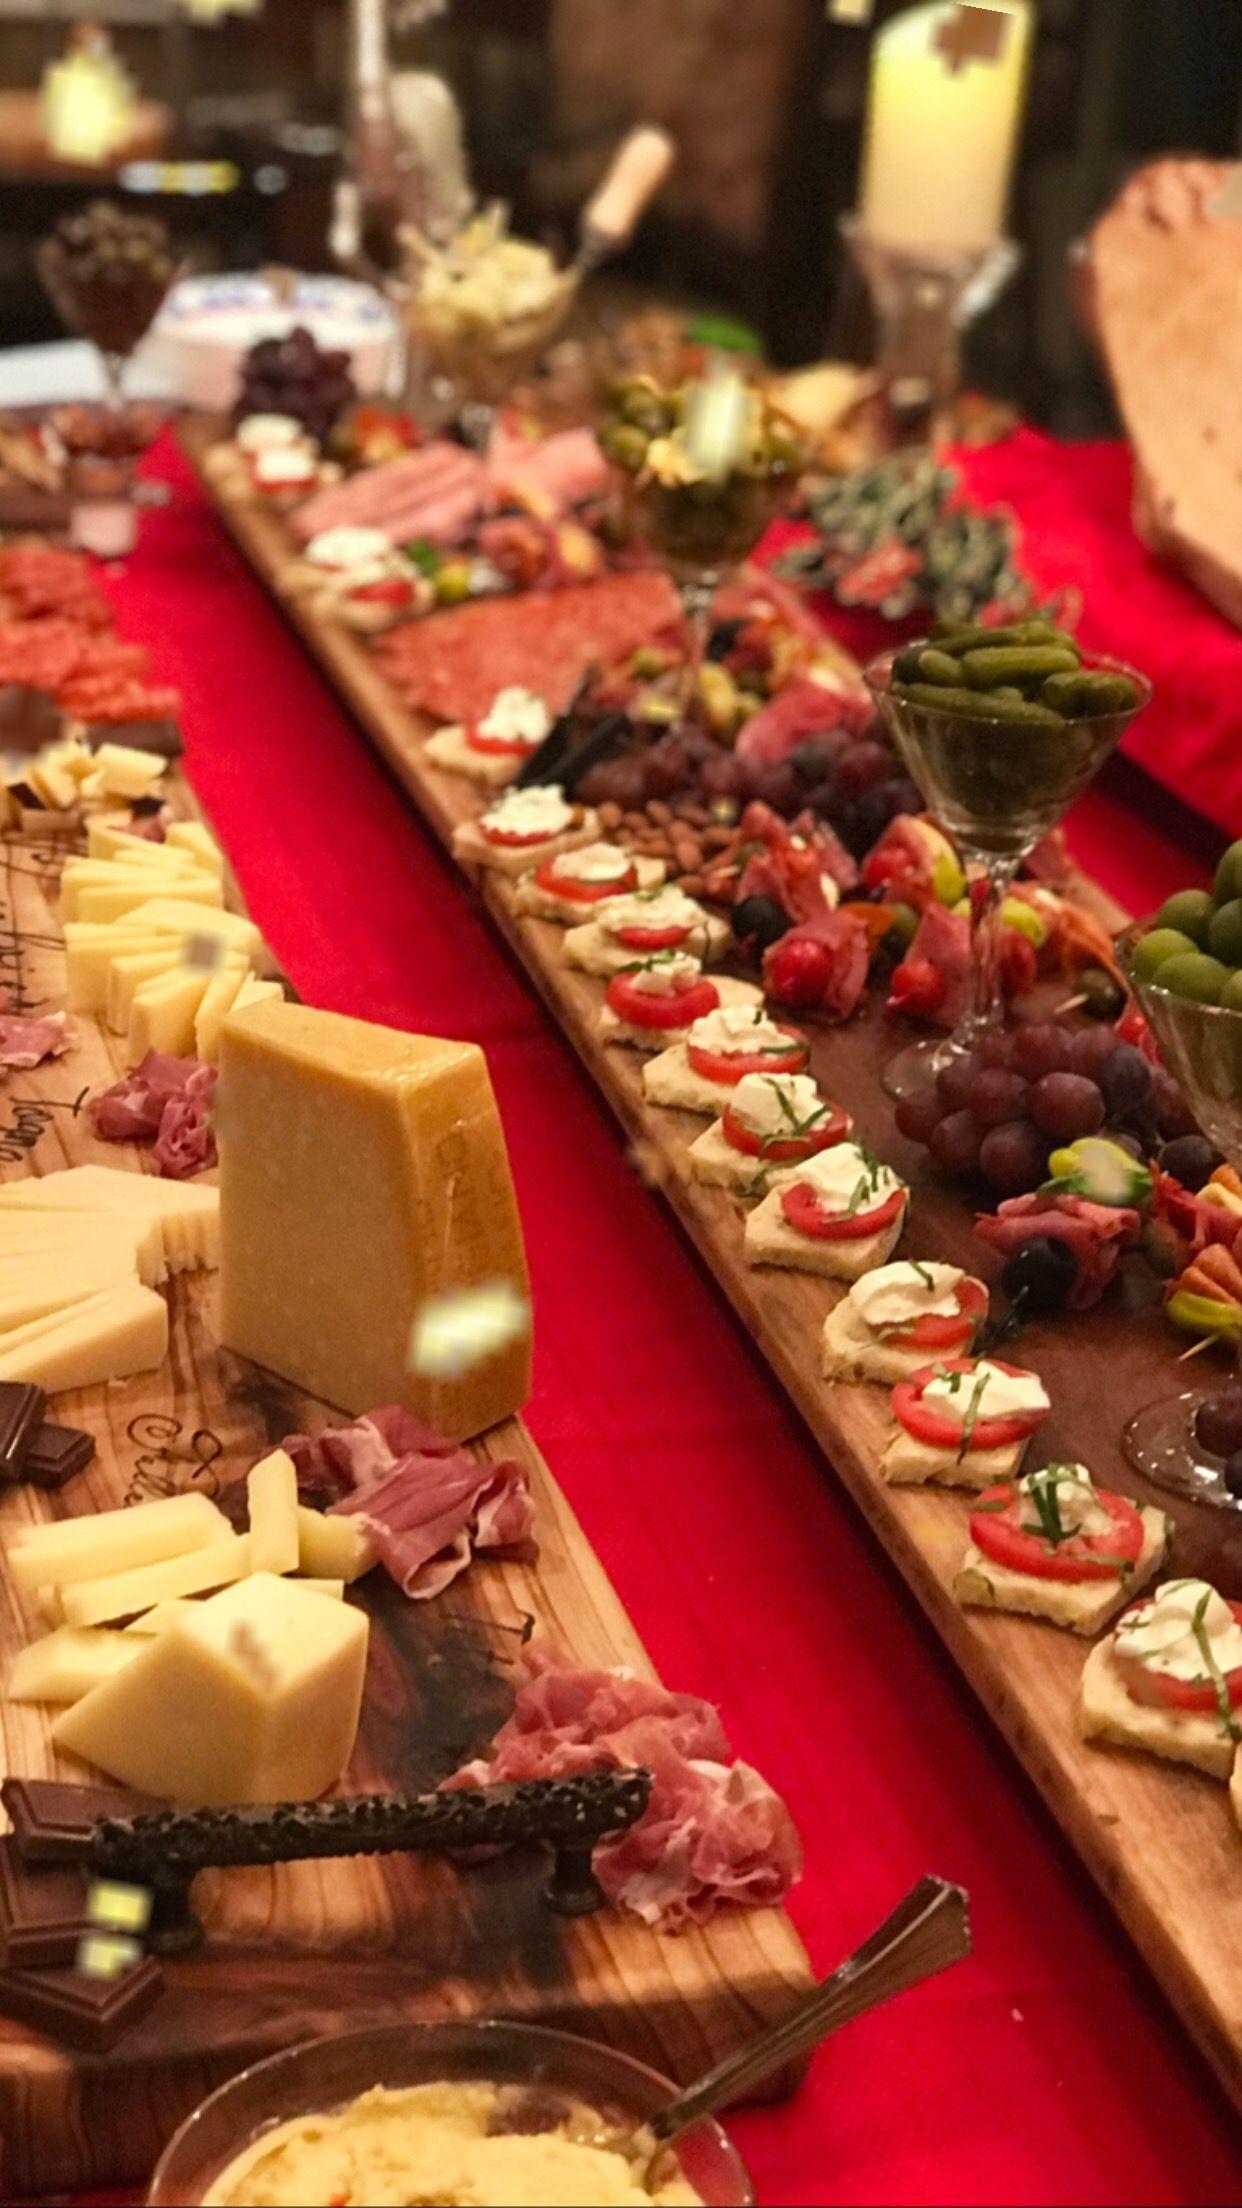 Geppetta Boards Handmade Wooden Charcuterie And Cheese Boards Geppetta Wedding Buffet Food Charcuterie And Cheese Board Buffet Food